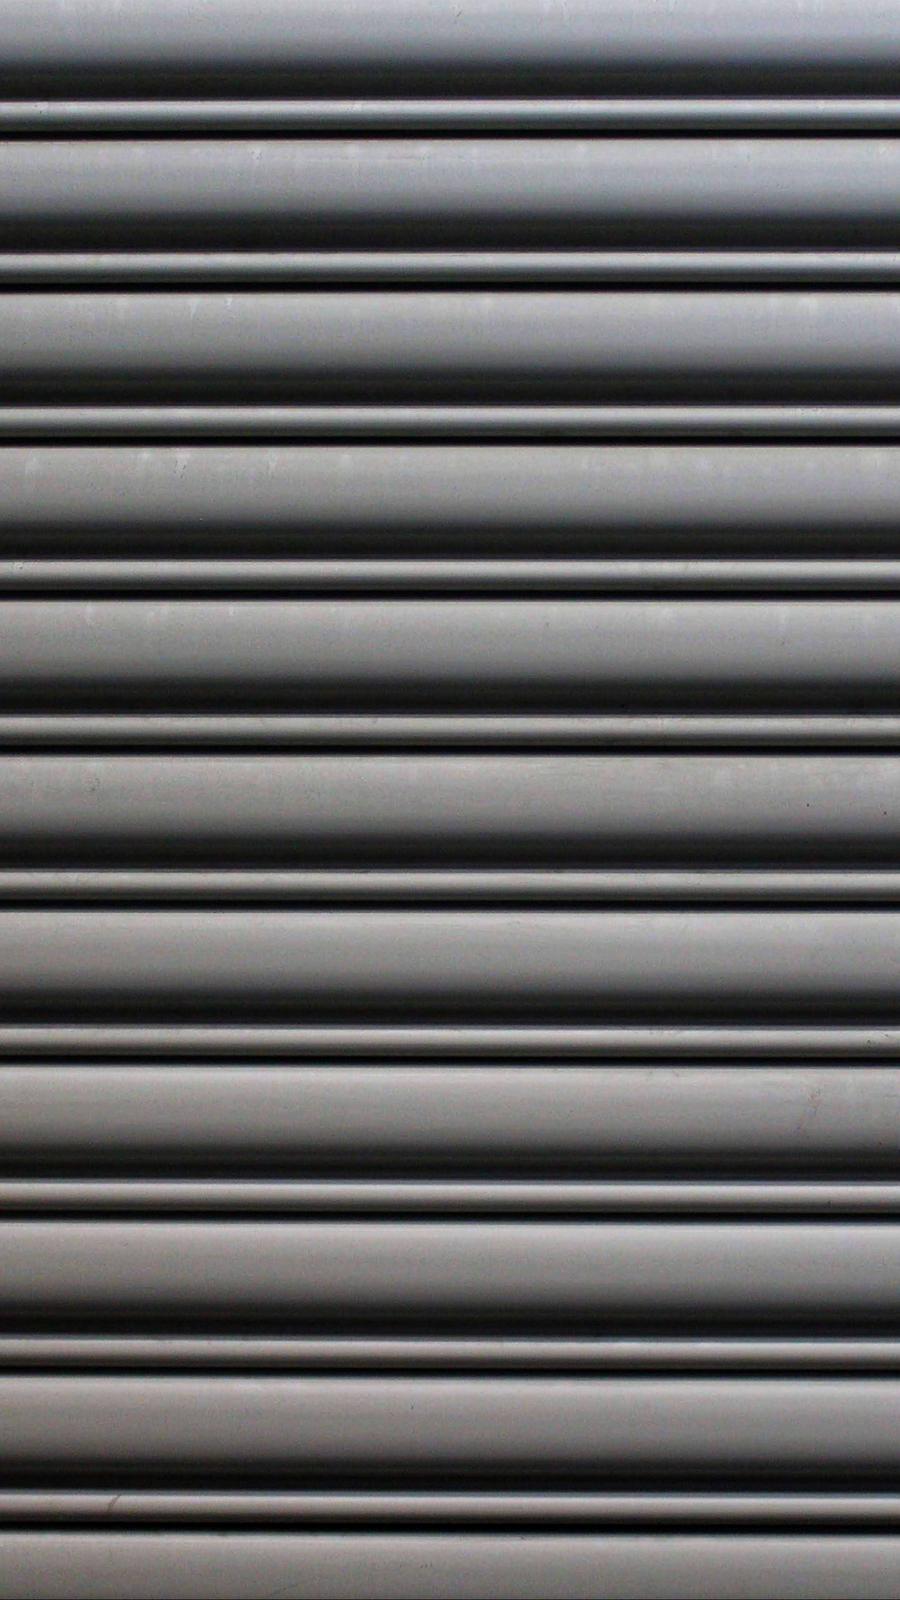 New Nokia 3 Wallpapers Download